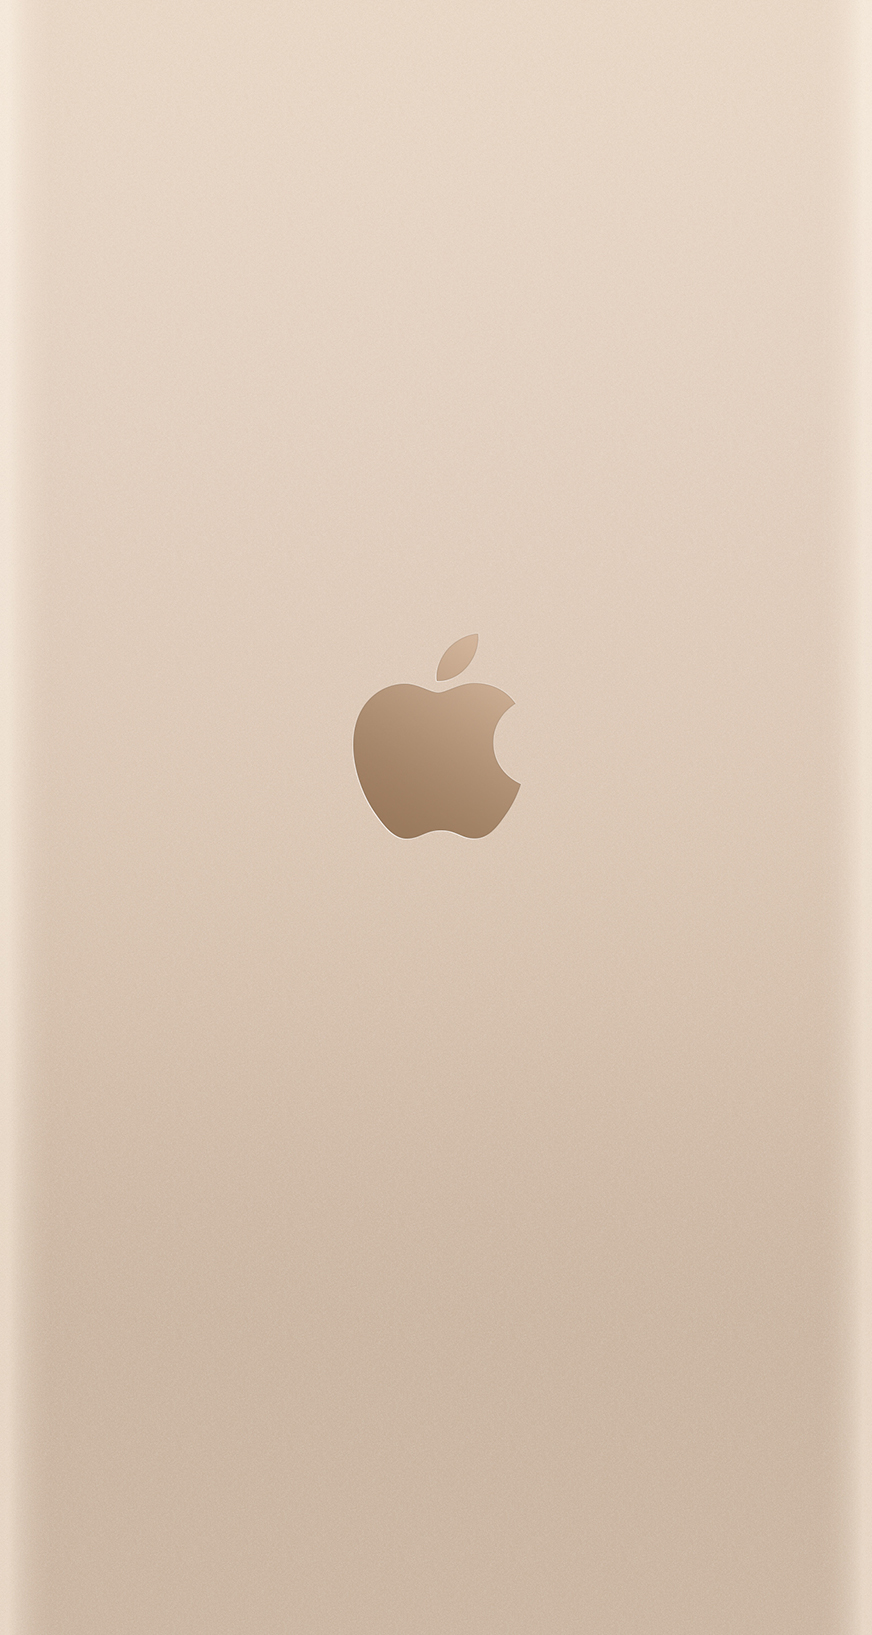 Fondos hd gold apple